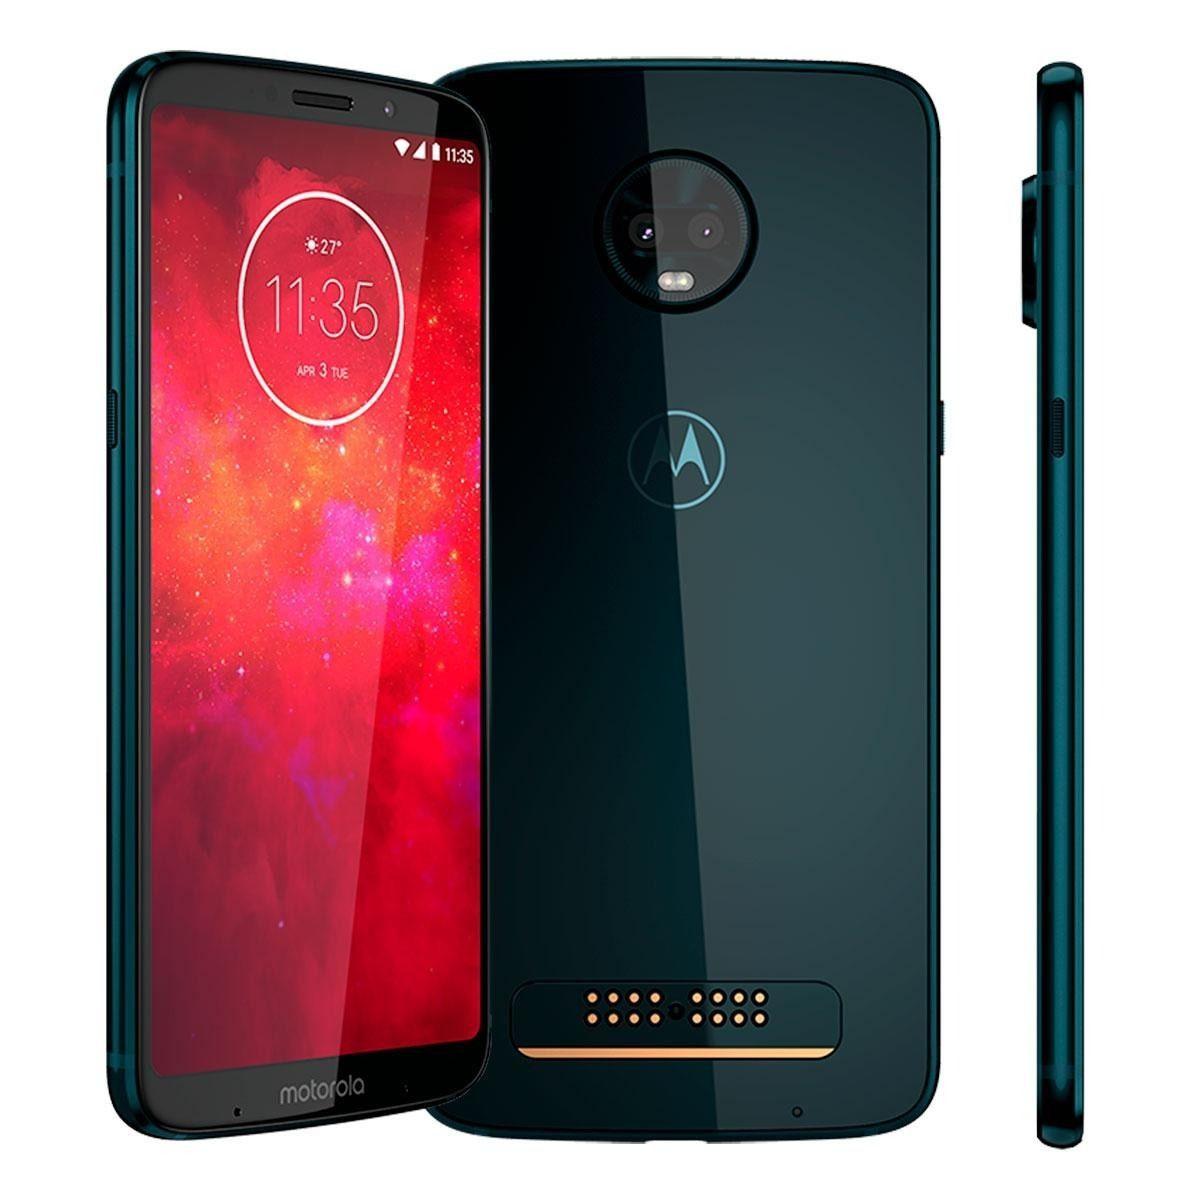 Smartphone Motorola Moto Z3 Play 64gb Índigo